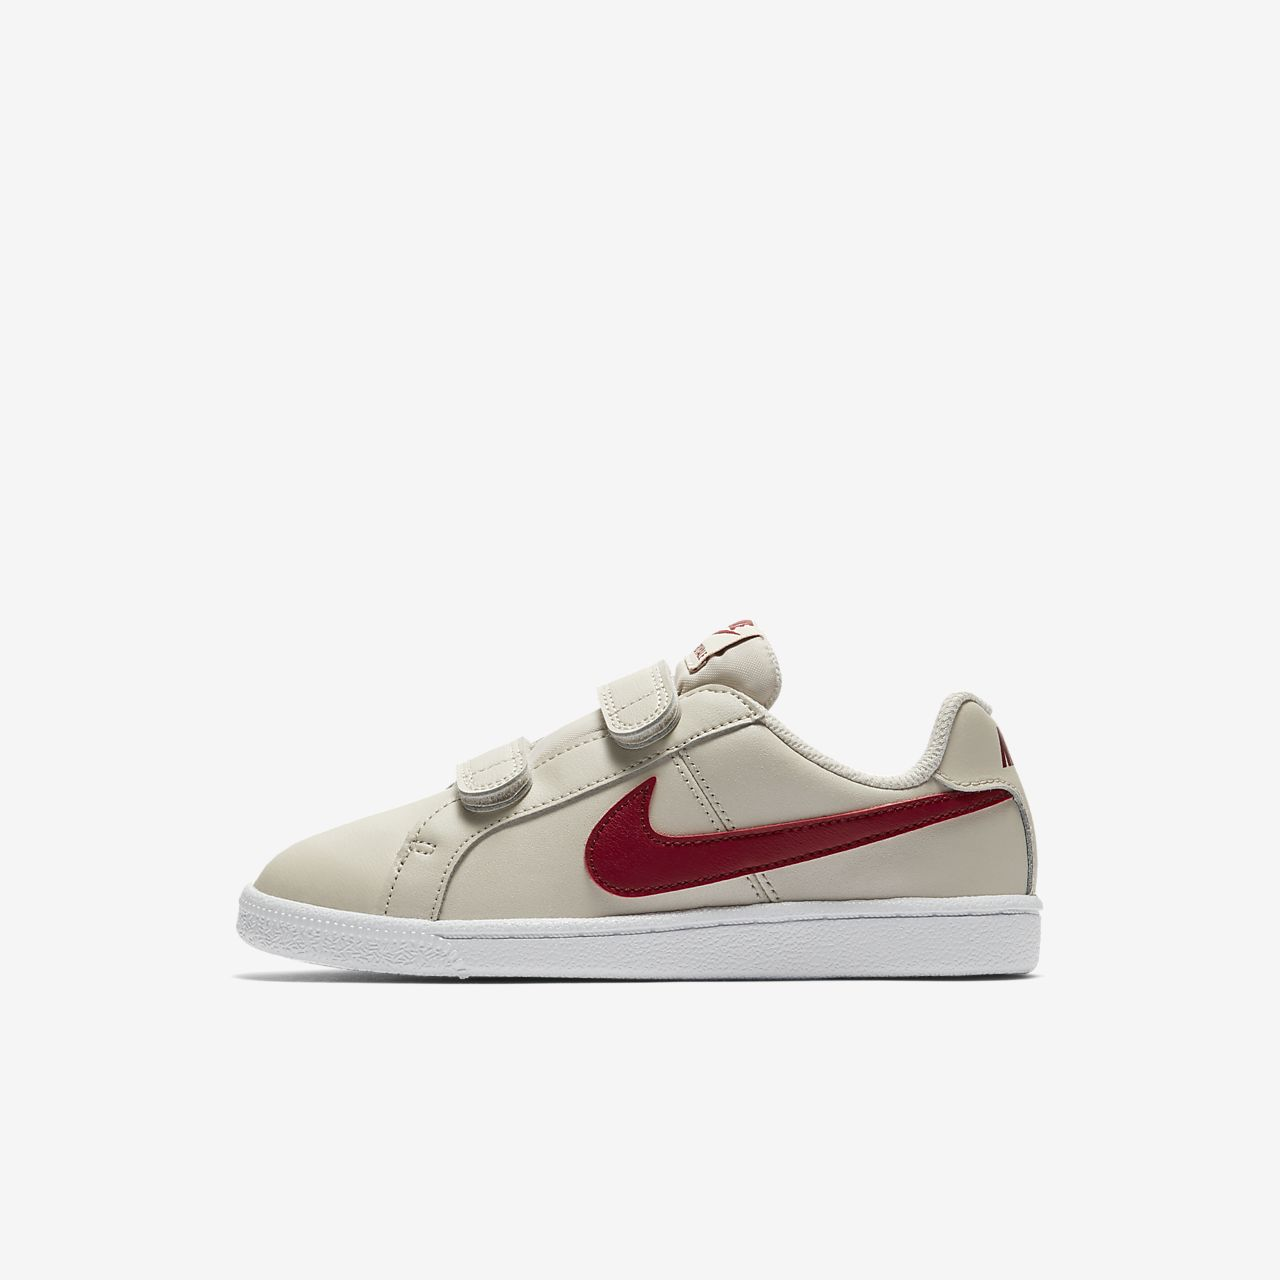 Nike Court Royale (PSV) 幼童运动童鞋